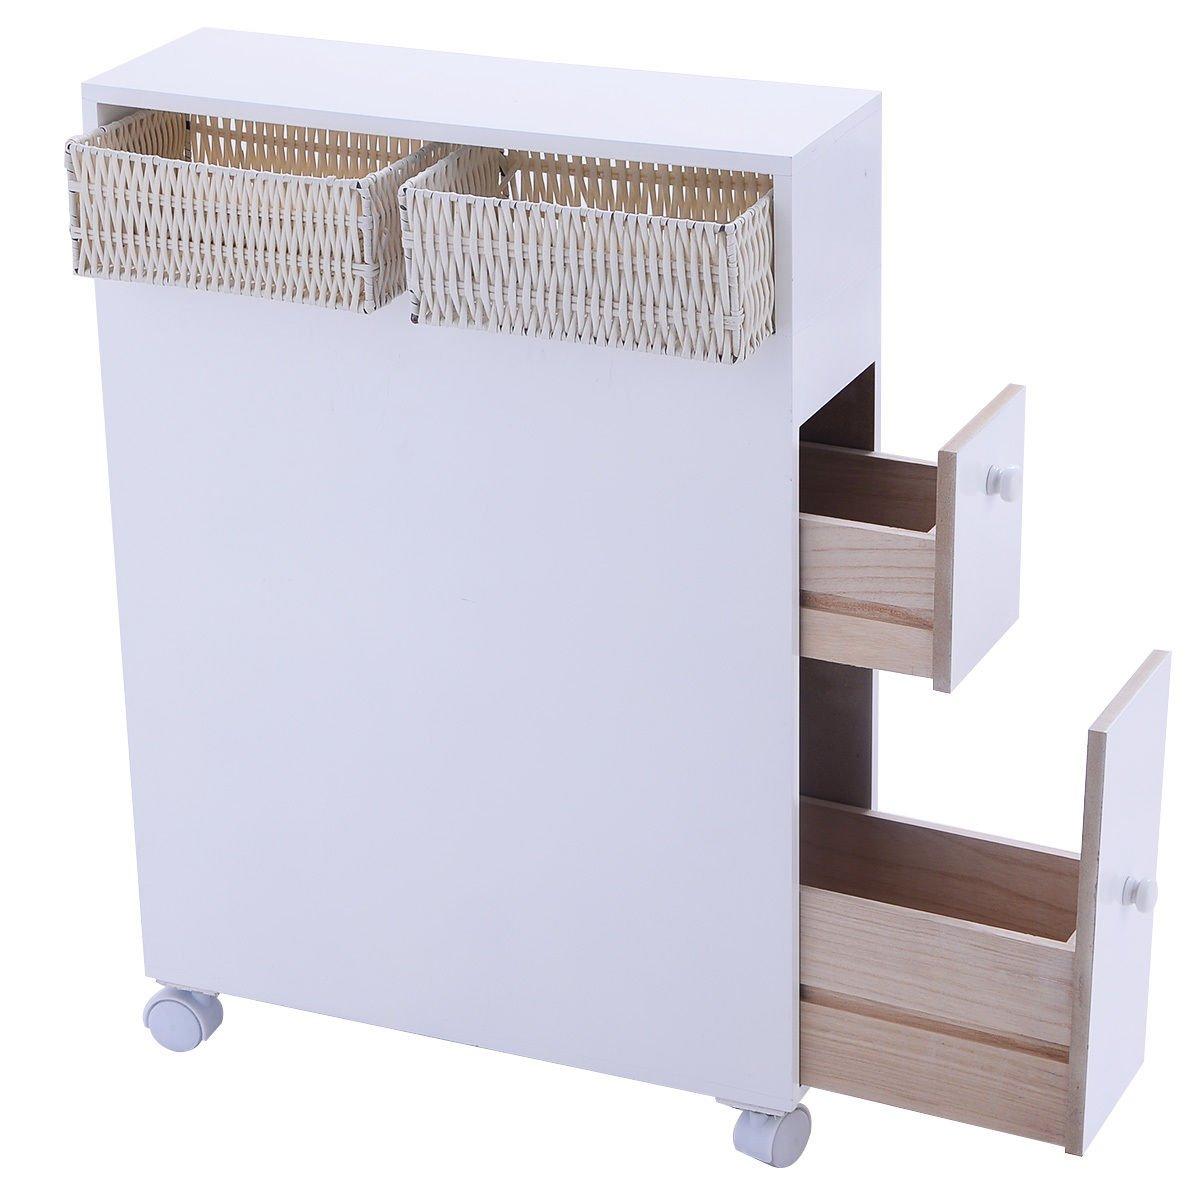 TANGKULA Bathroom Storage Wood Bathroom Rolling Floor Cabinet Wooden Floor  Home Bath Toilet Organizer Floor Storage Cabinet With Drawers And Baskets,  White ...